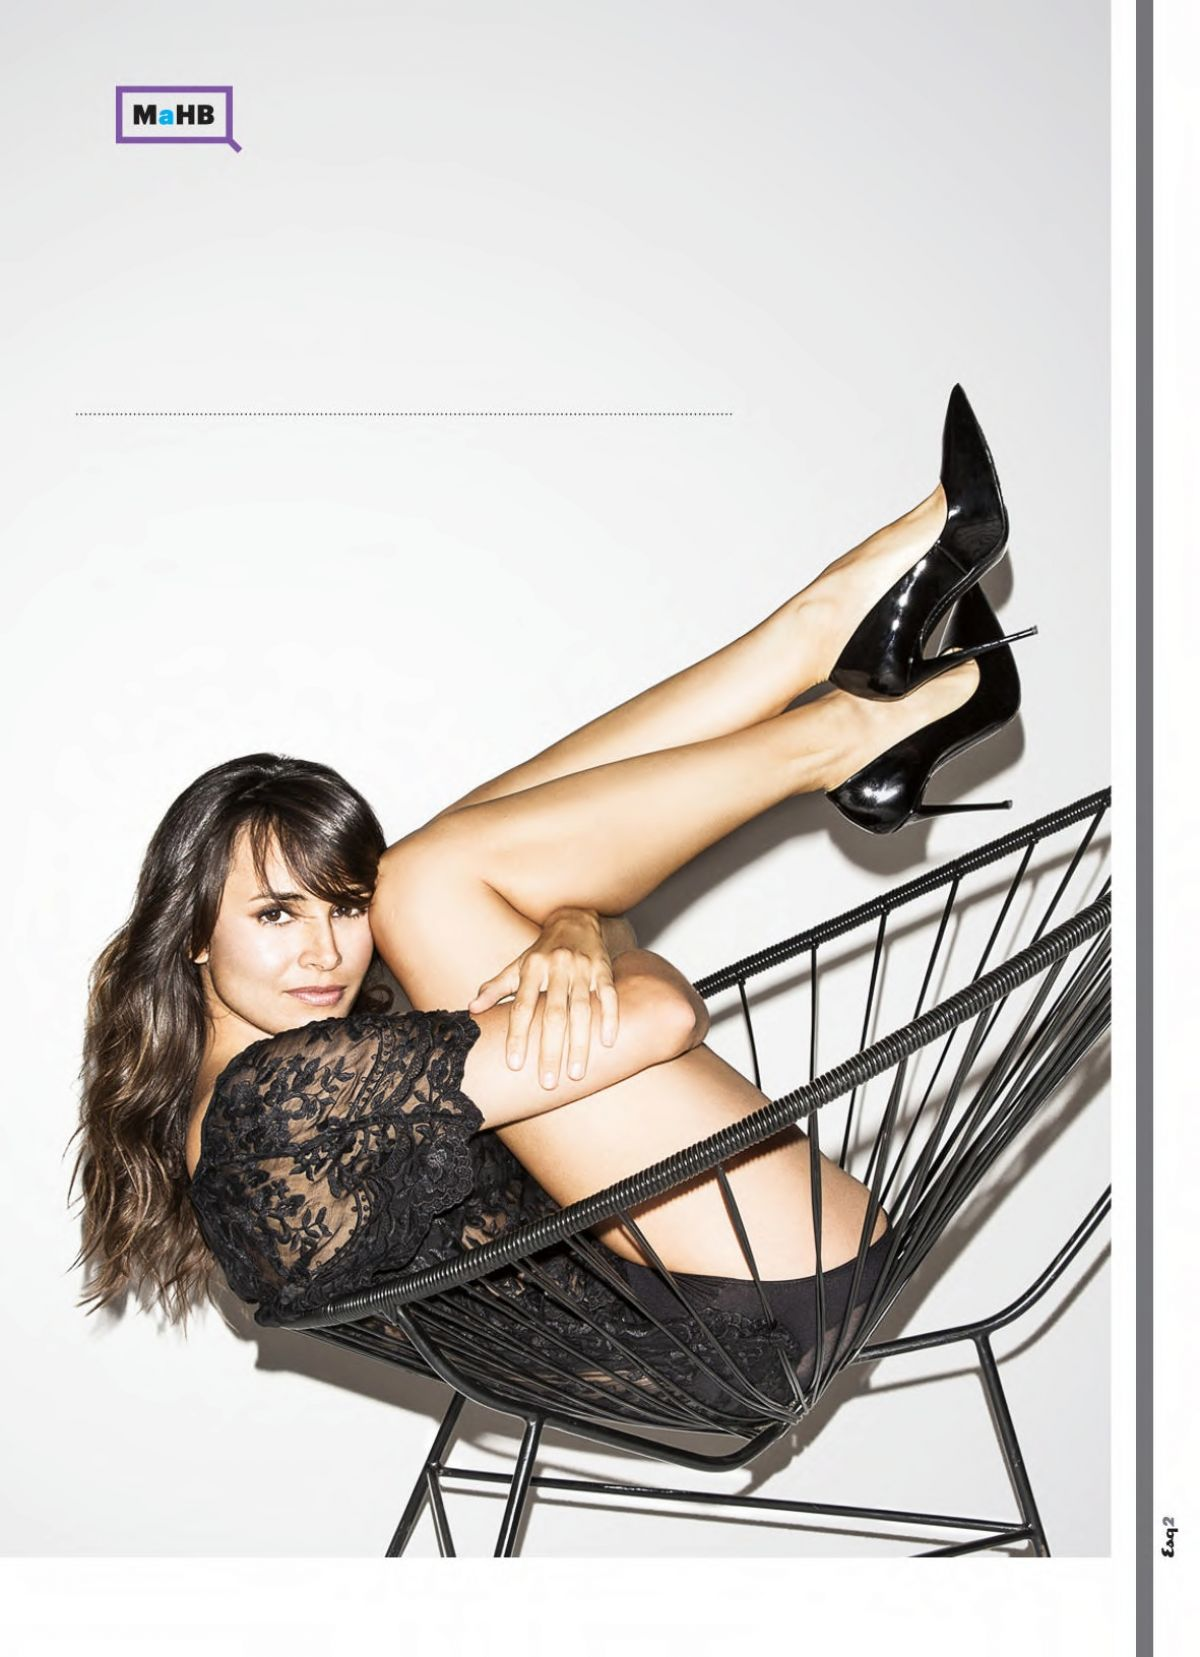 MIA MAESTRO in Esquire Magazine, September 2015 Issue